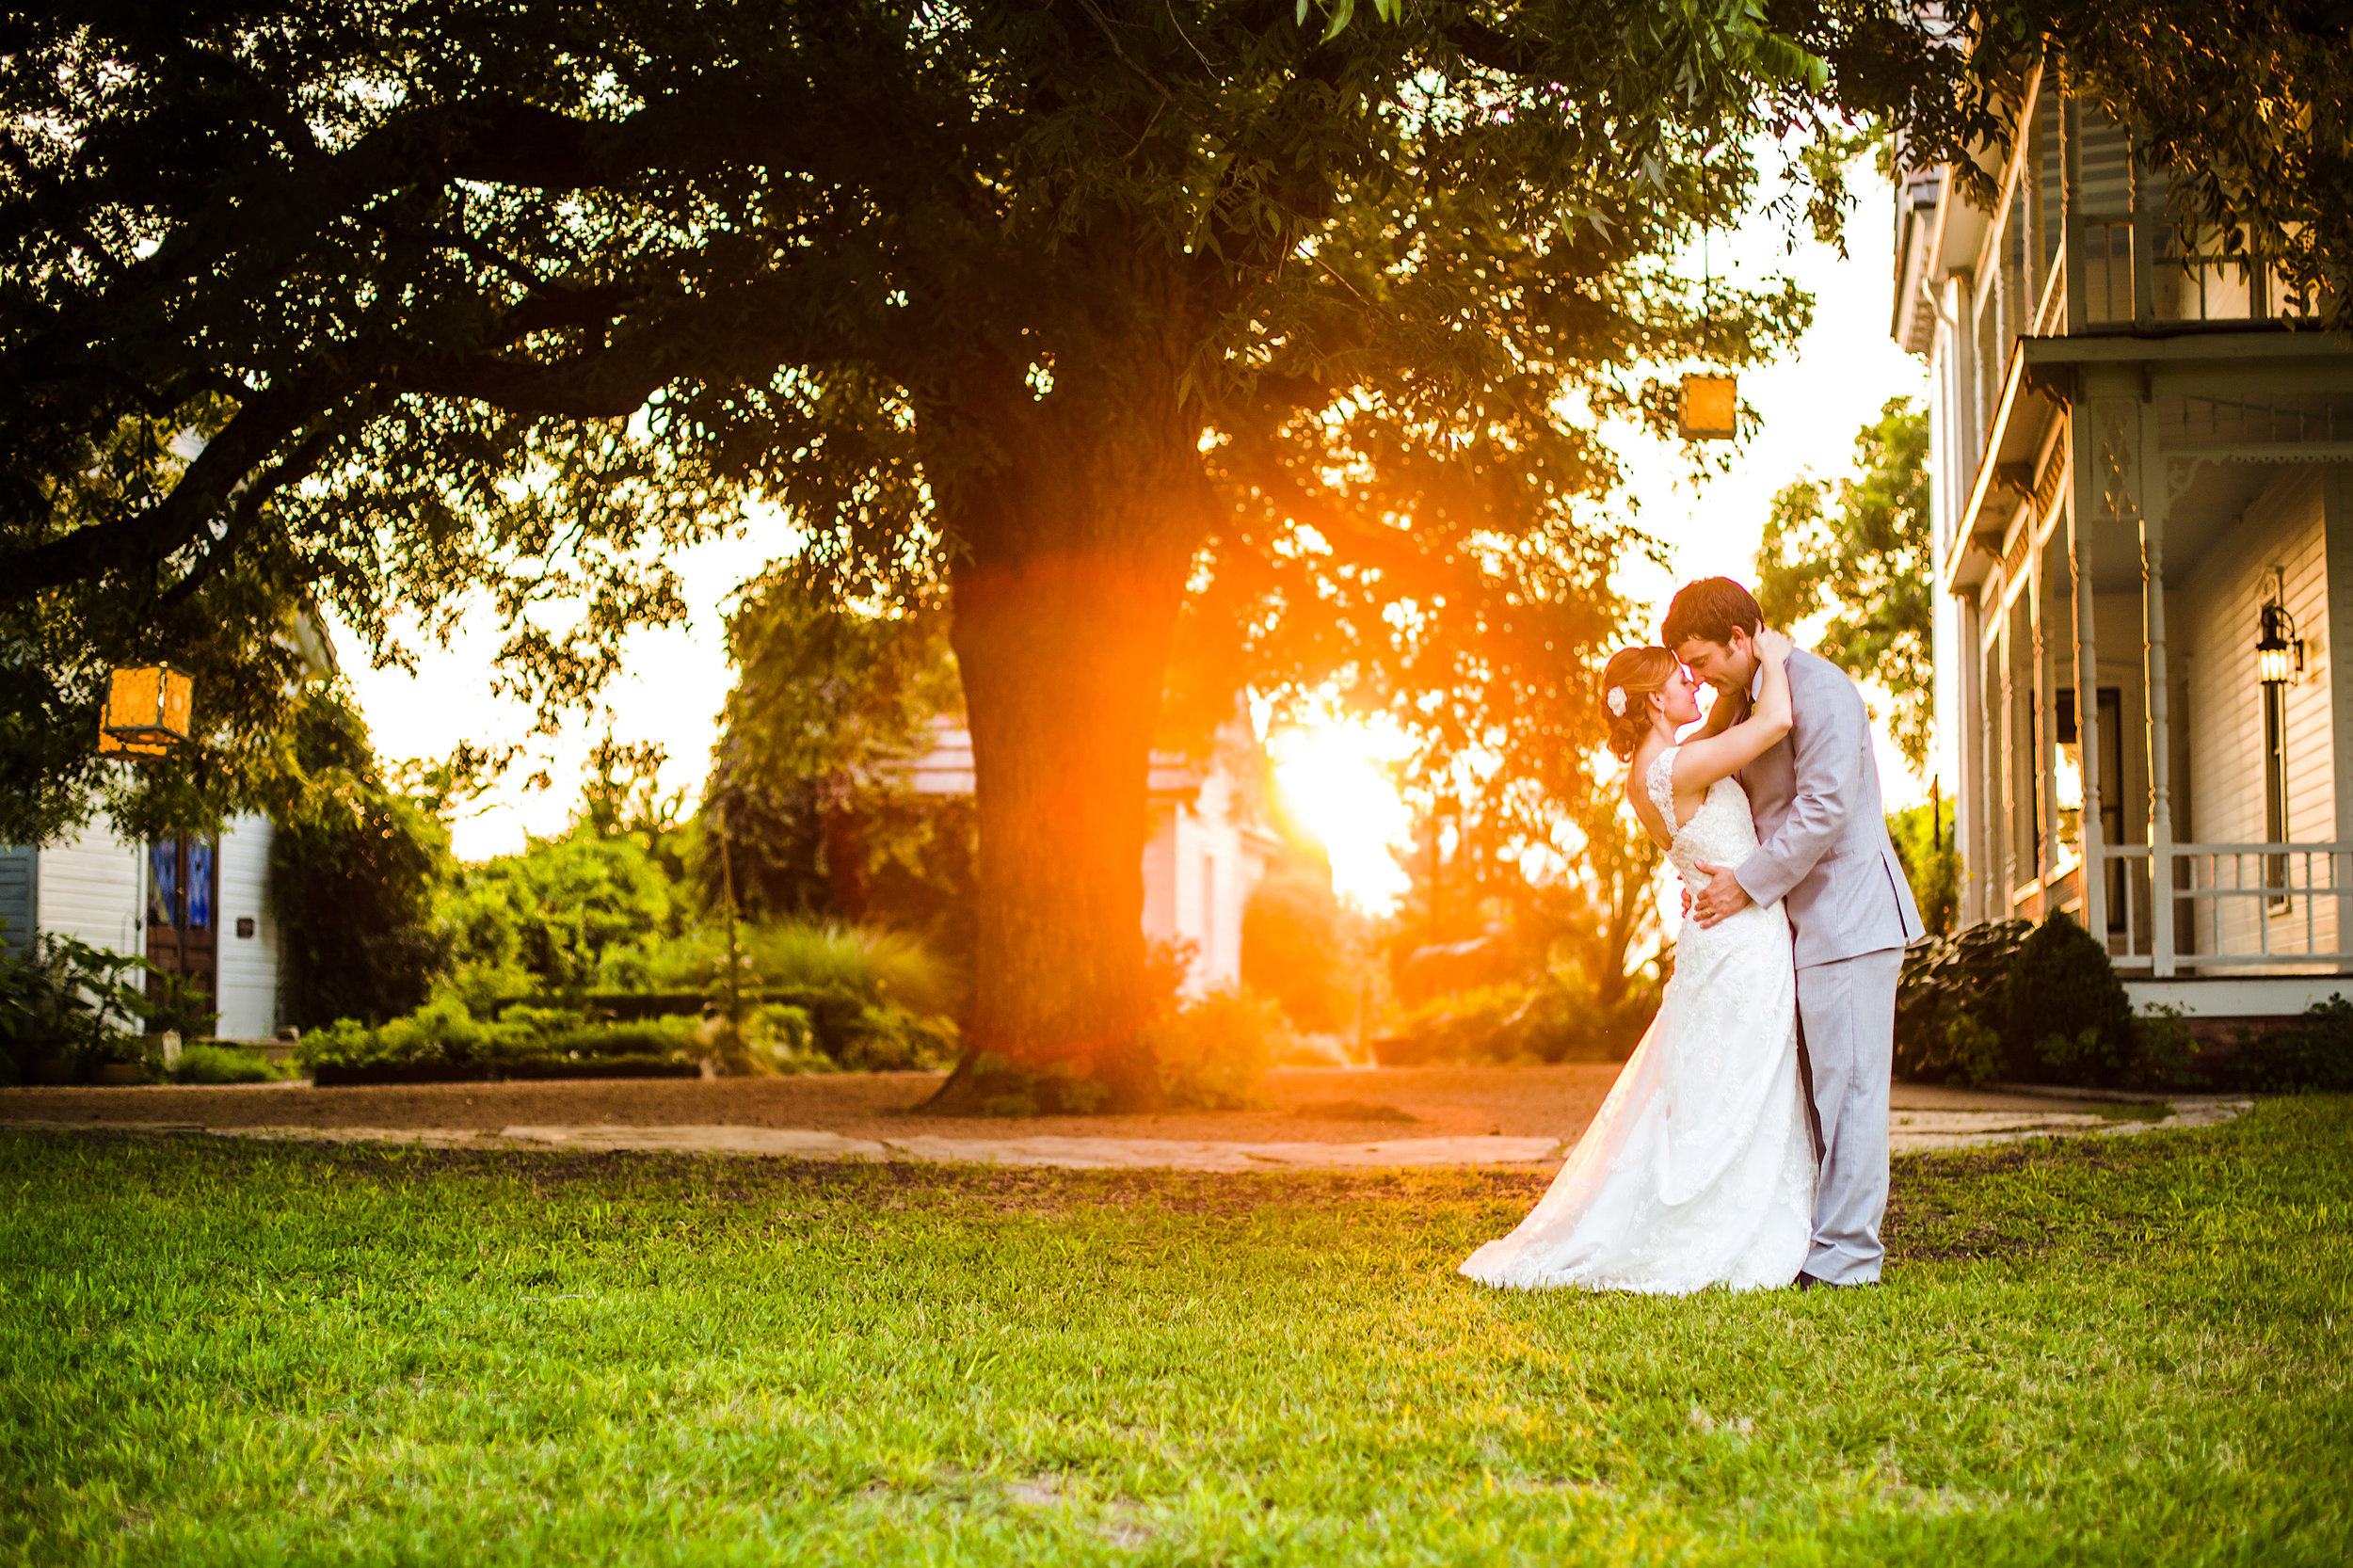 Day of Wedding - $2,200 - 1 photographer 7 hours$2,600 - 2 photographers 8 hours$2,850 - 2 photographers up to 8 hours + engagement or bridal